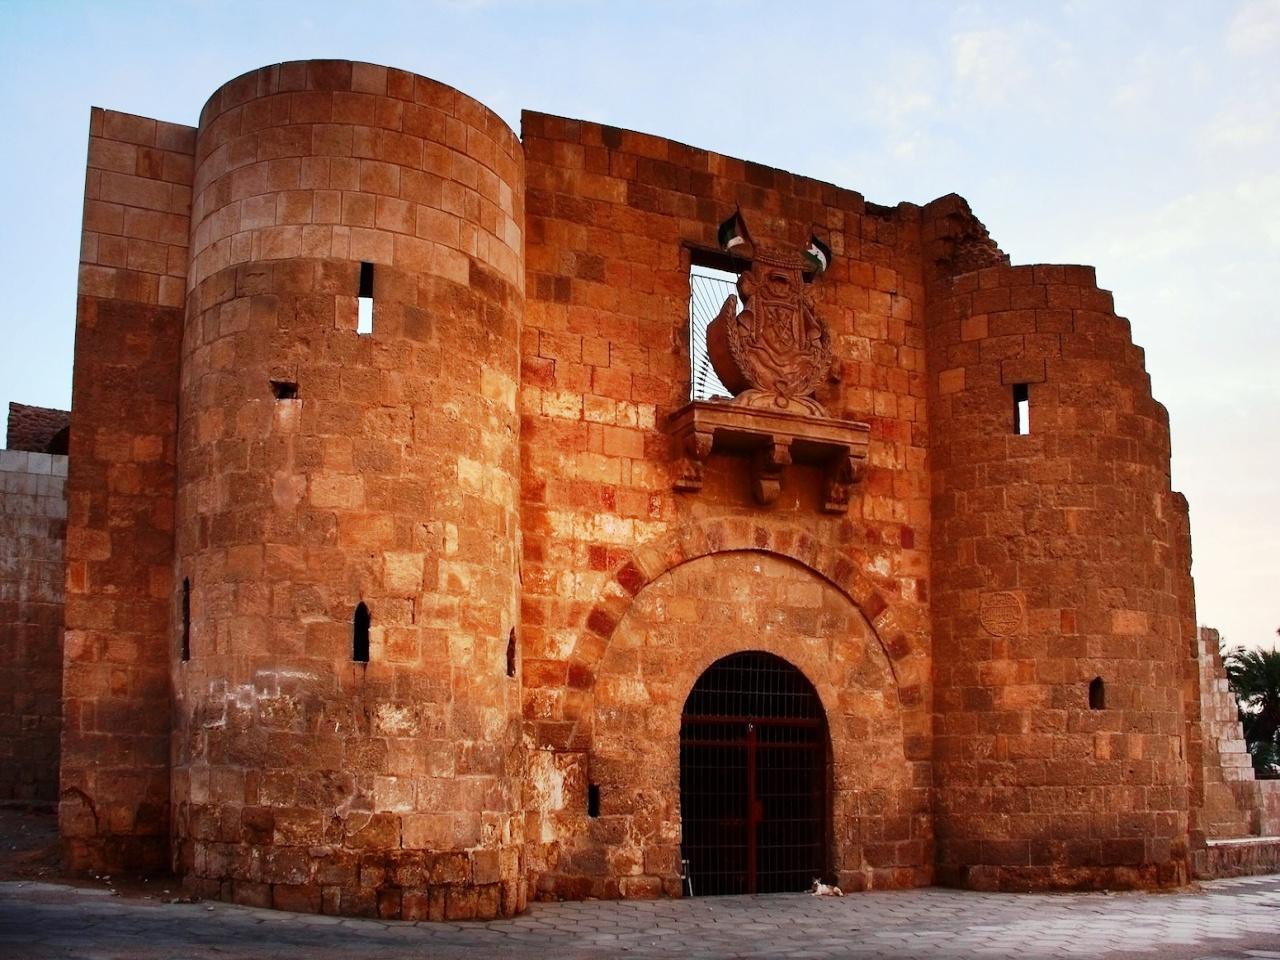 Мамлюкский форт — Акаба, Иордания